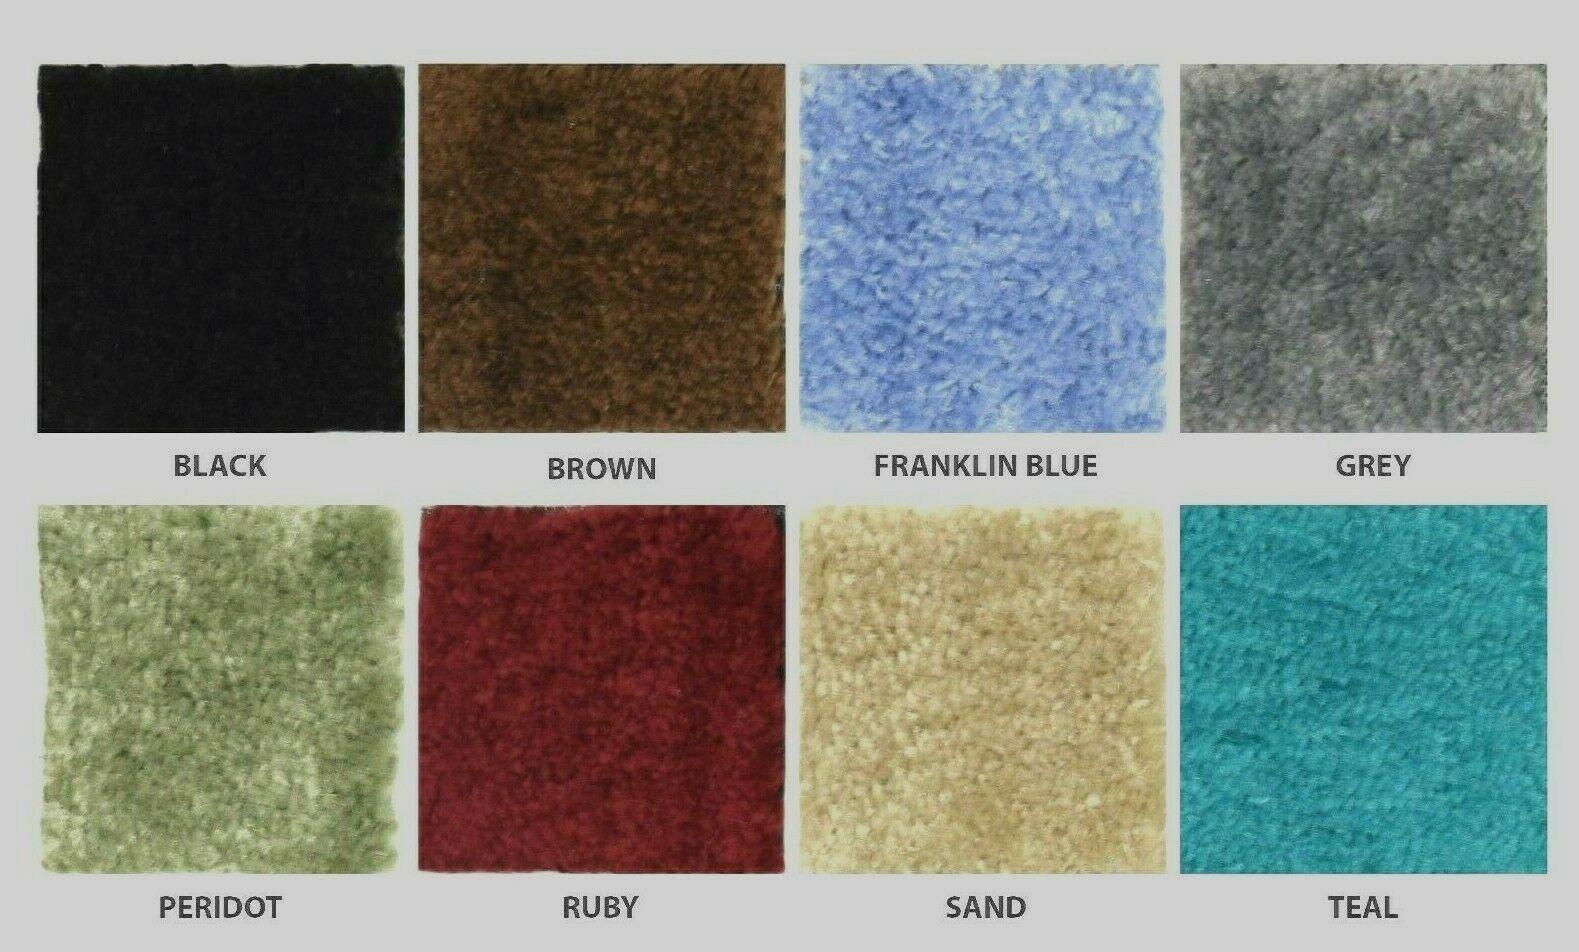 Madison Industries Plush Bathroom Carpet 5 X 6 For Sale Online Ebay